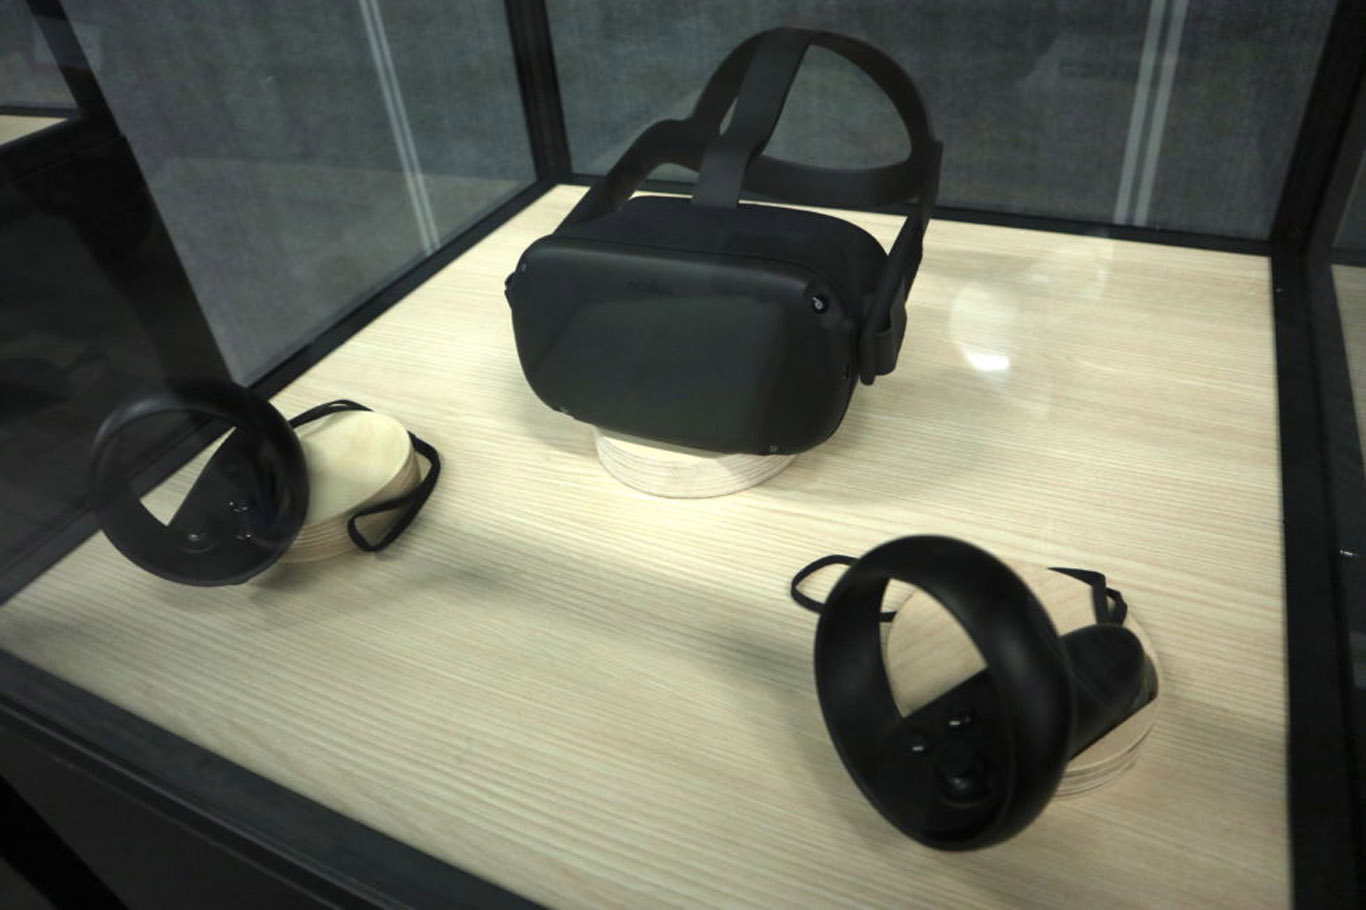 Oculus Quest vs Vive Focus: let the battle begin - The Ghost